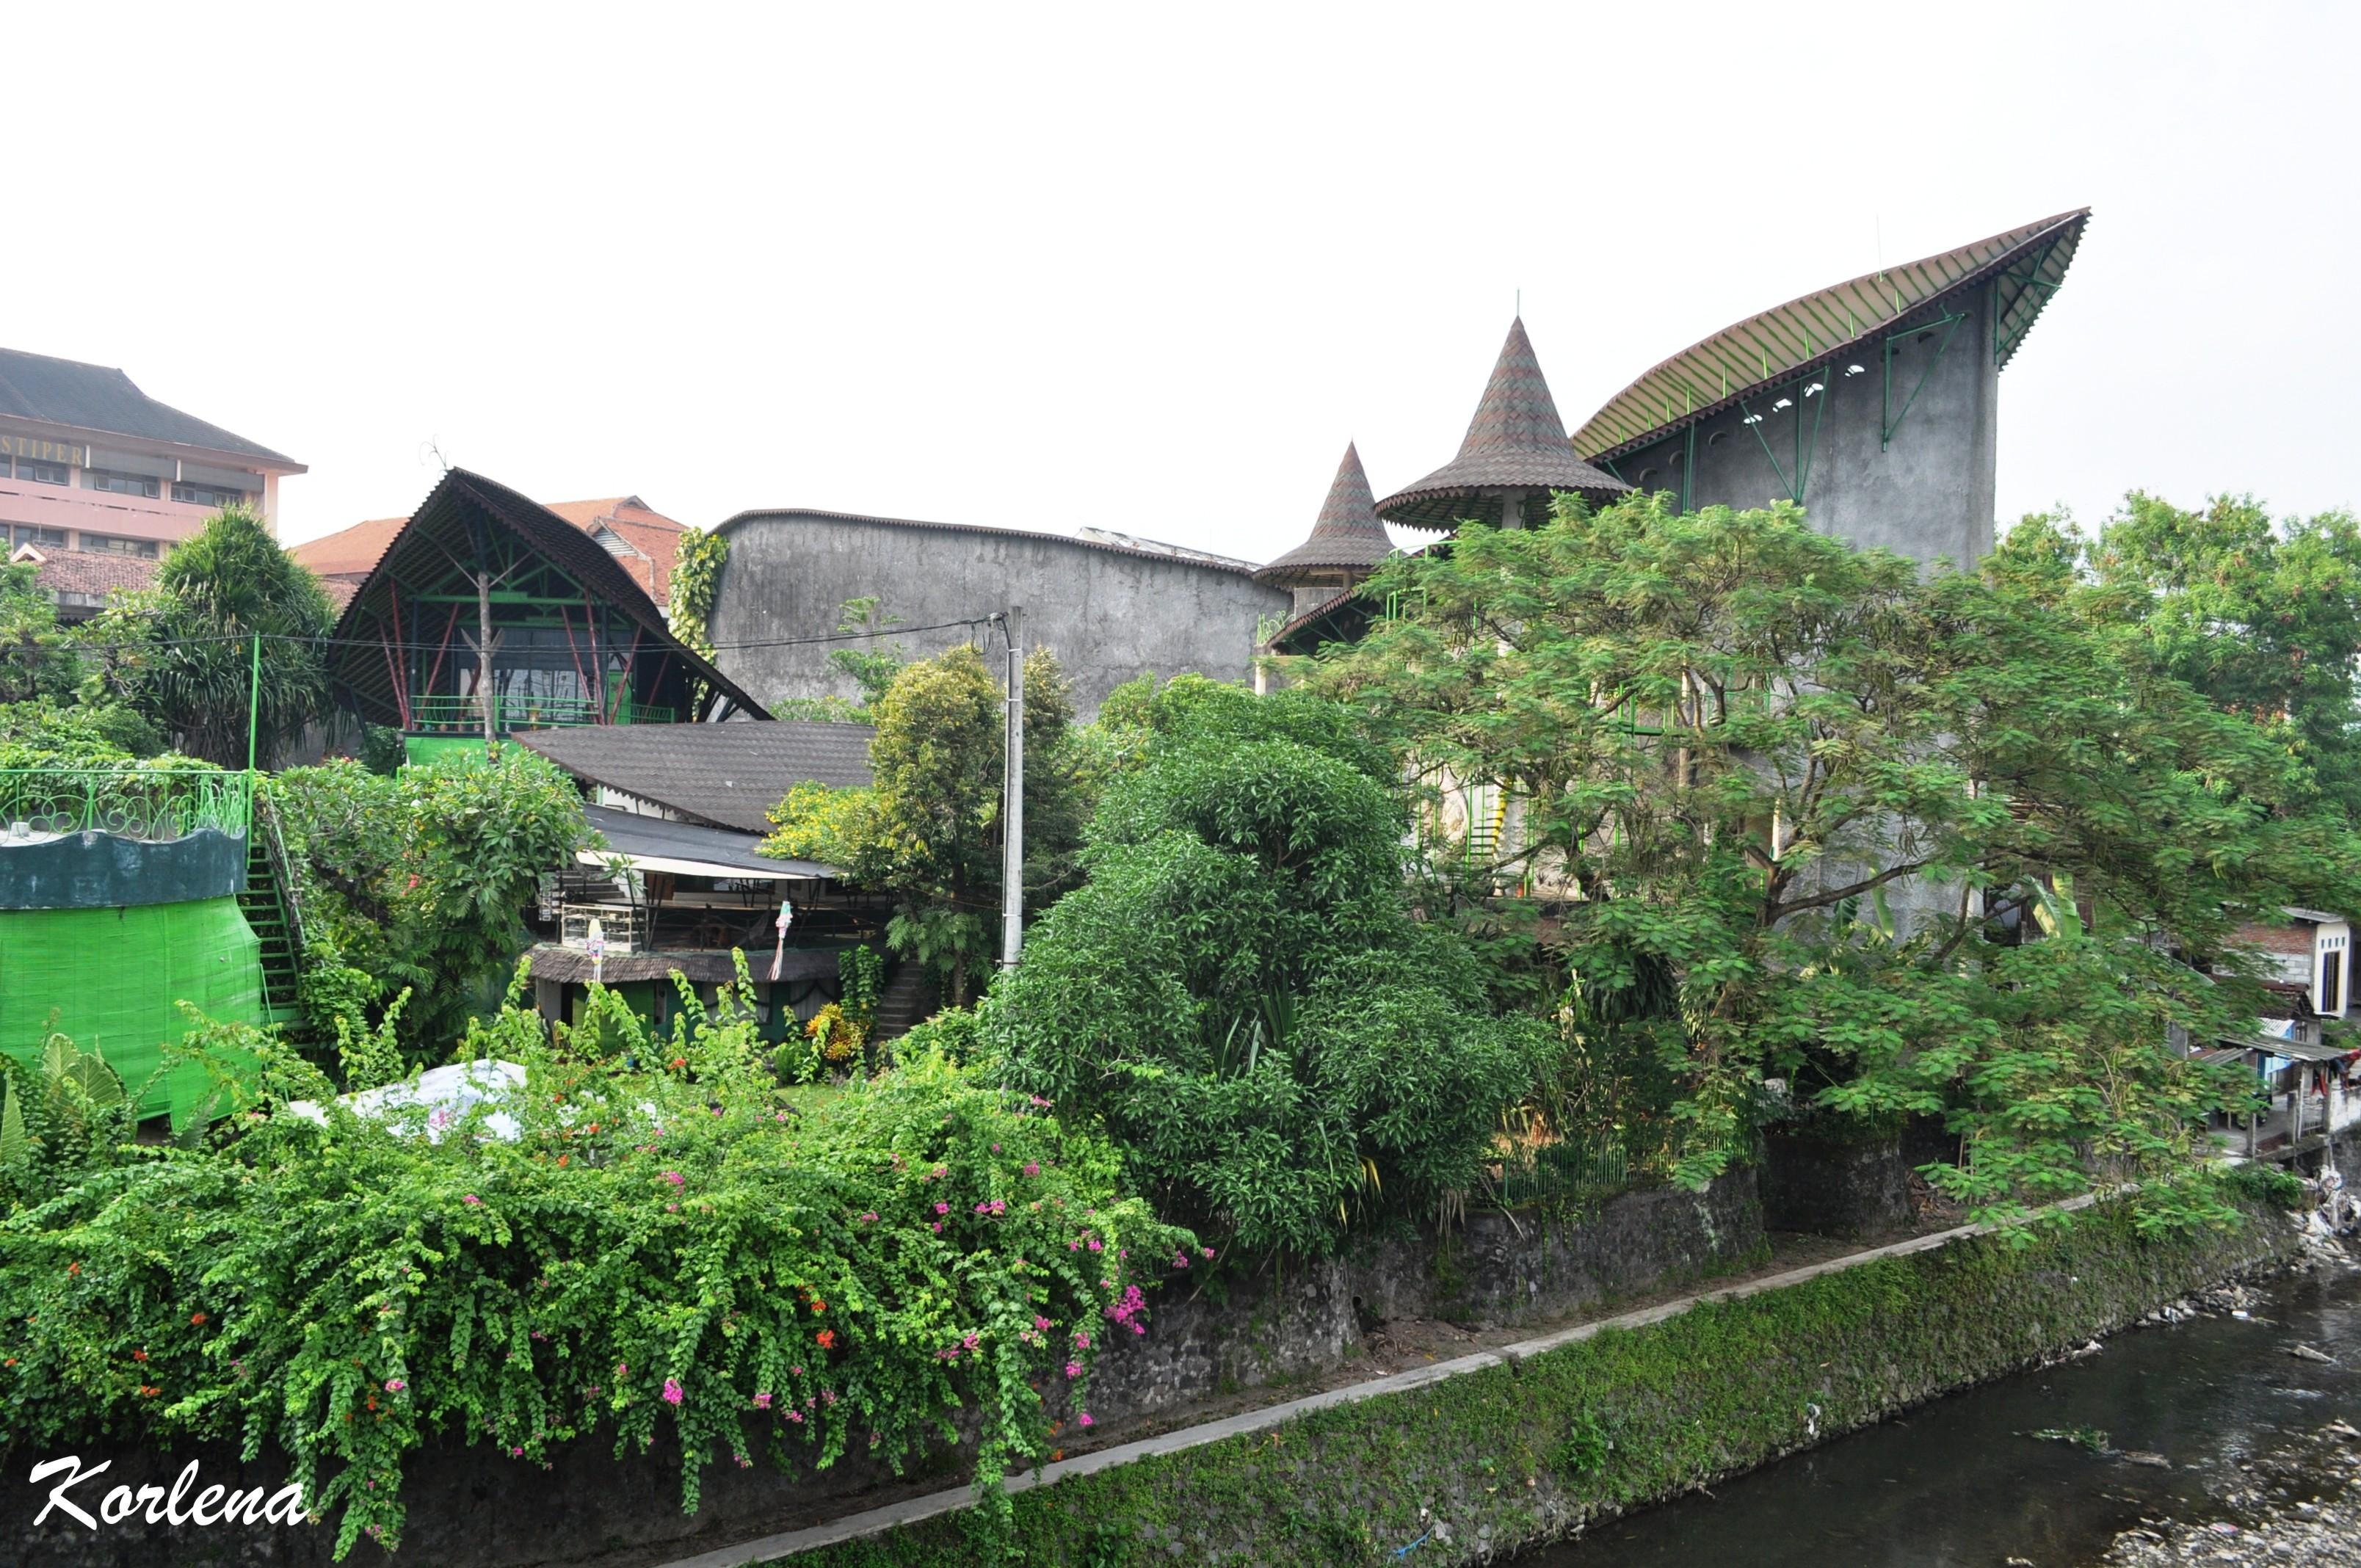 Museum Affandi Lukisan Maestro Indonesia Urban Rural Tepi Sungai Gajah